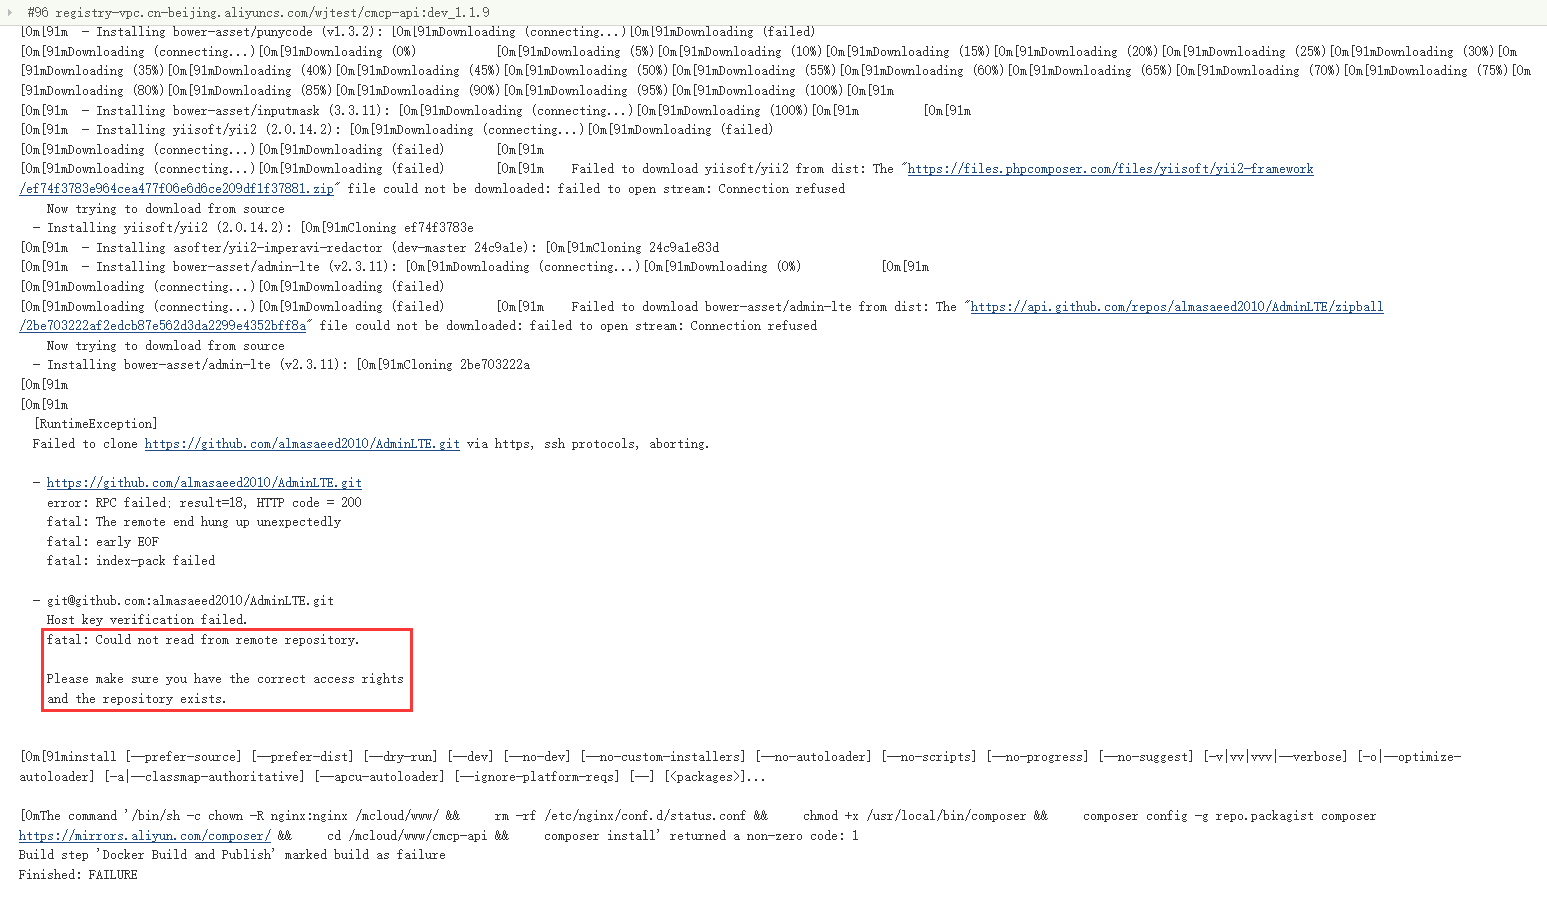 在 jenkins 中构建镜像时,报错:fatal: Could not read from remote repository.。虽然 Packagist 镜像地址已经切换为阿里云:https://mirrors.aliyun.com/composer/ 。查看 Dockerfile。